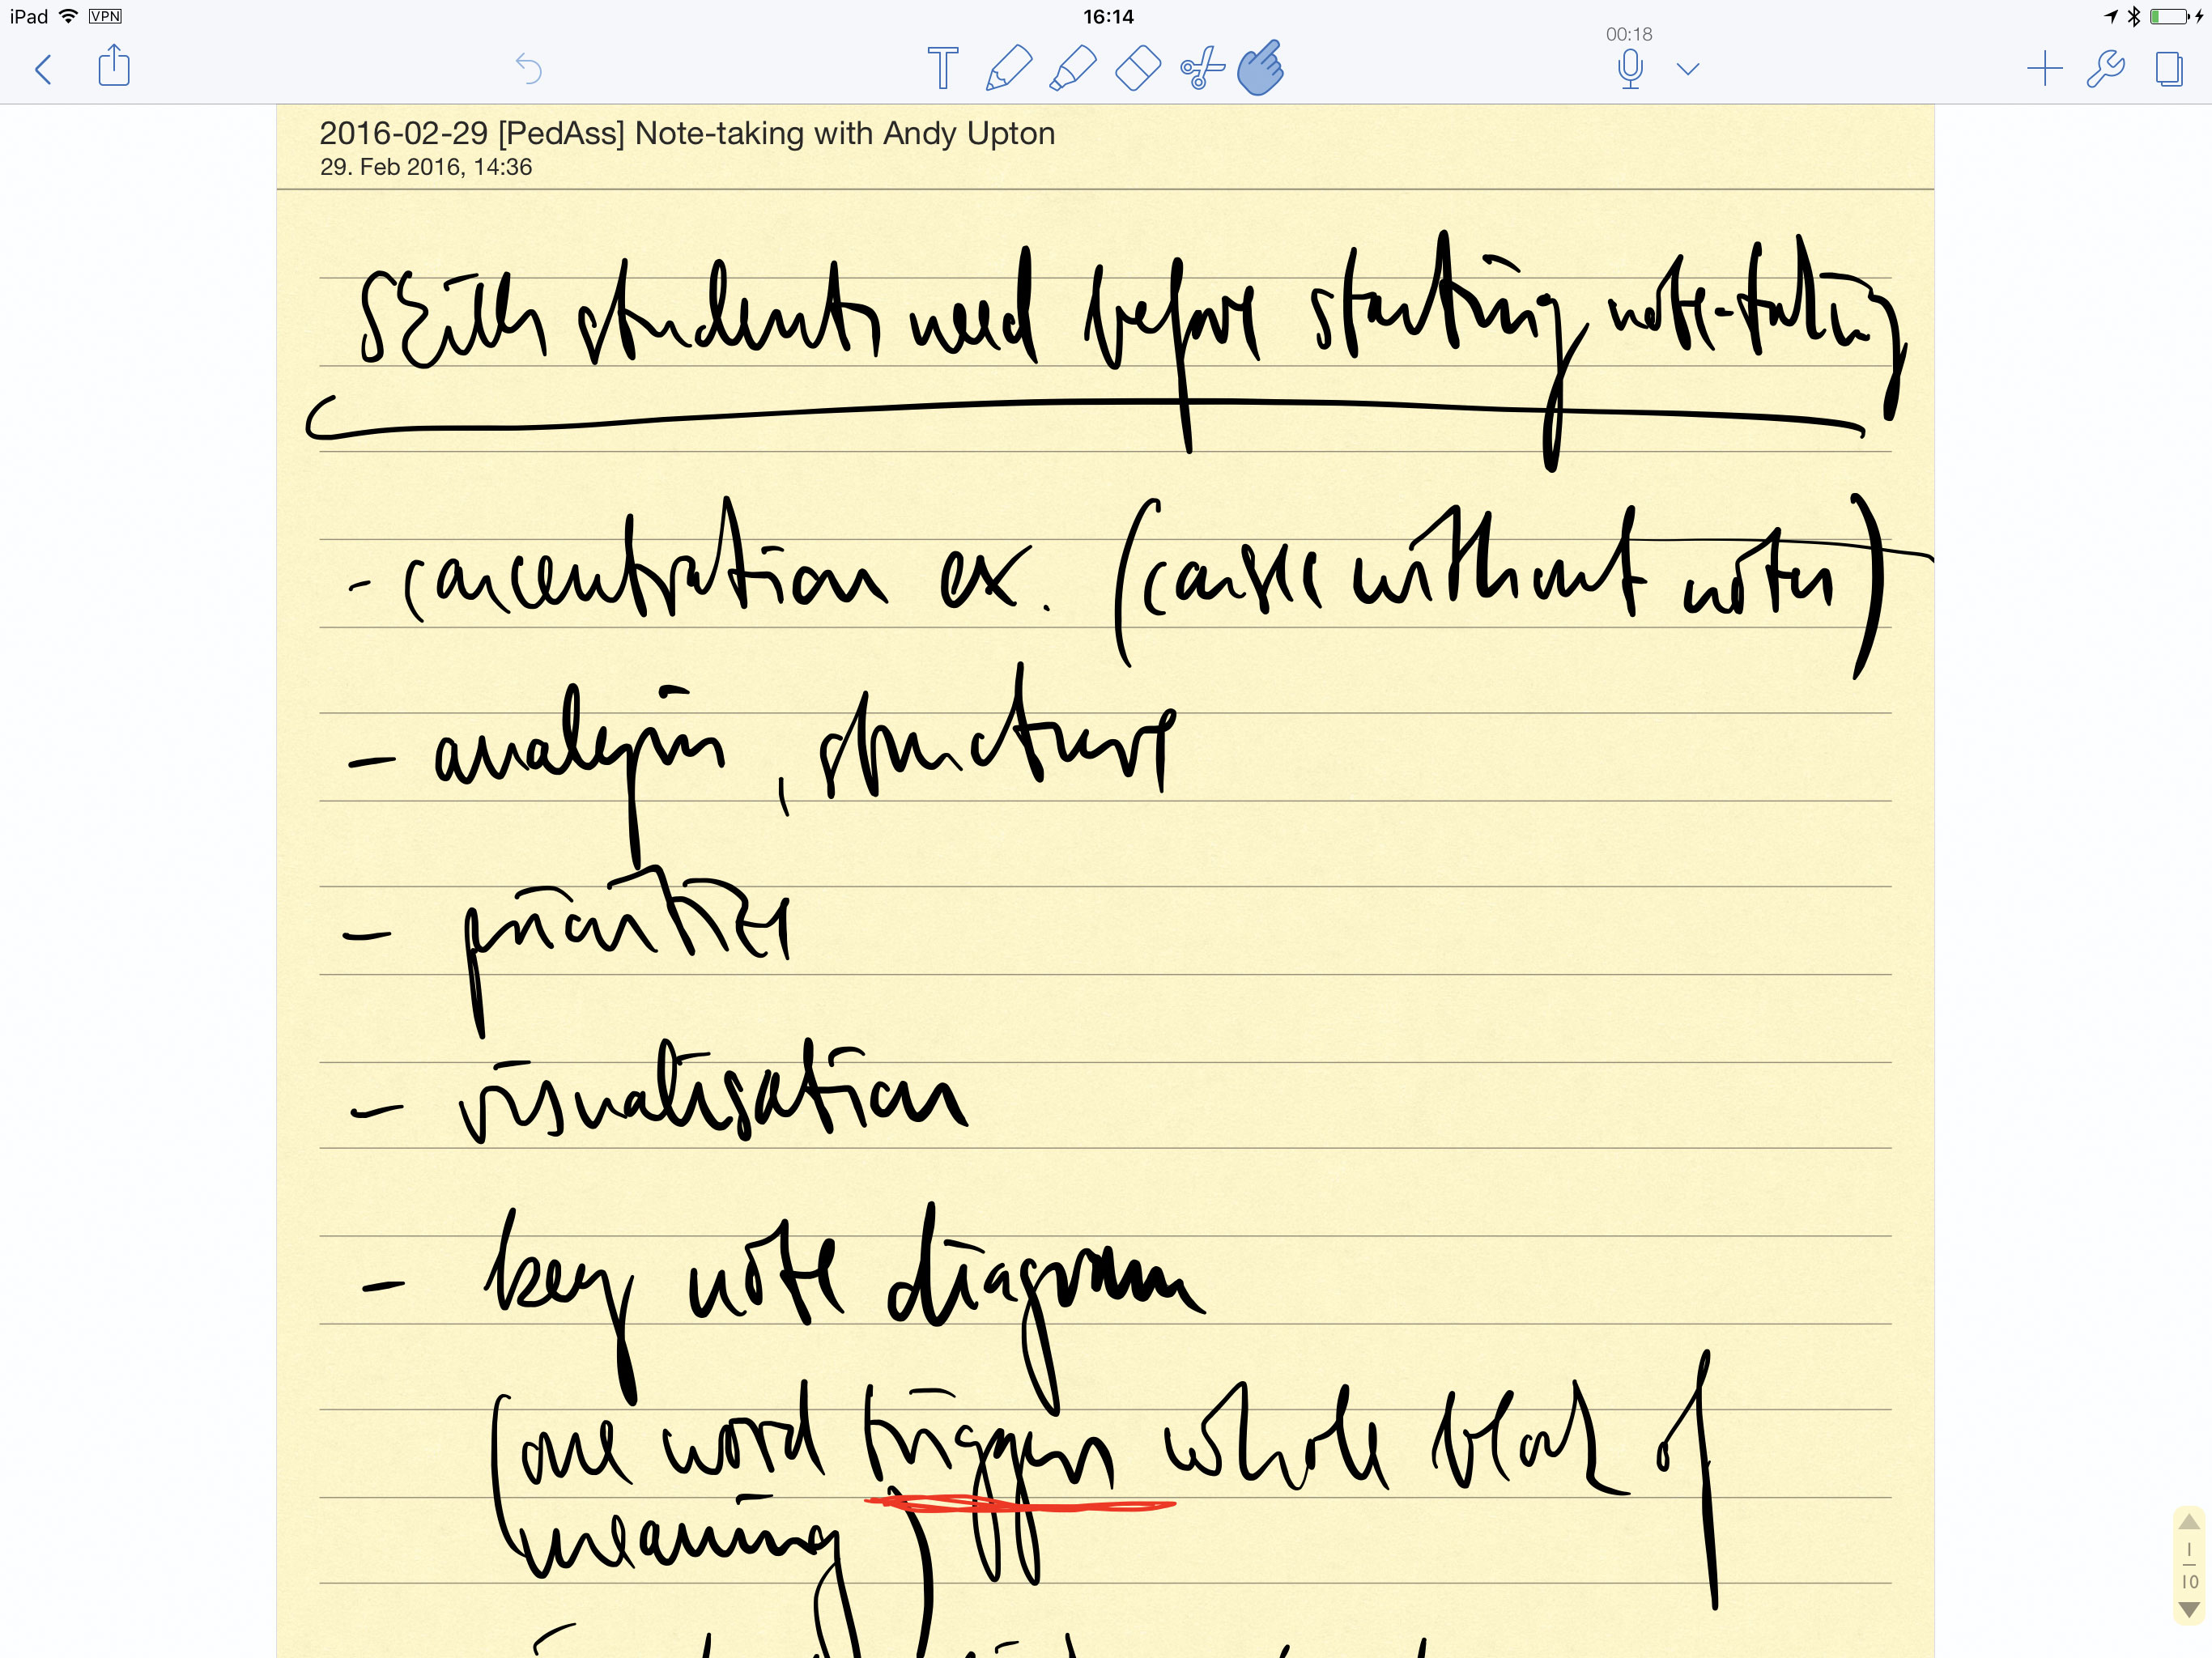 Figure 3: A screenshot of handwritten notes in the Notability app